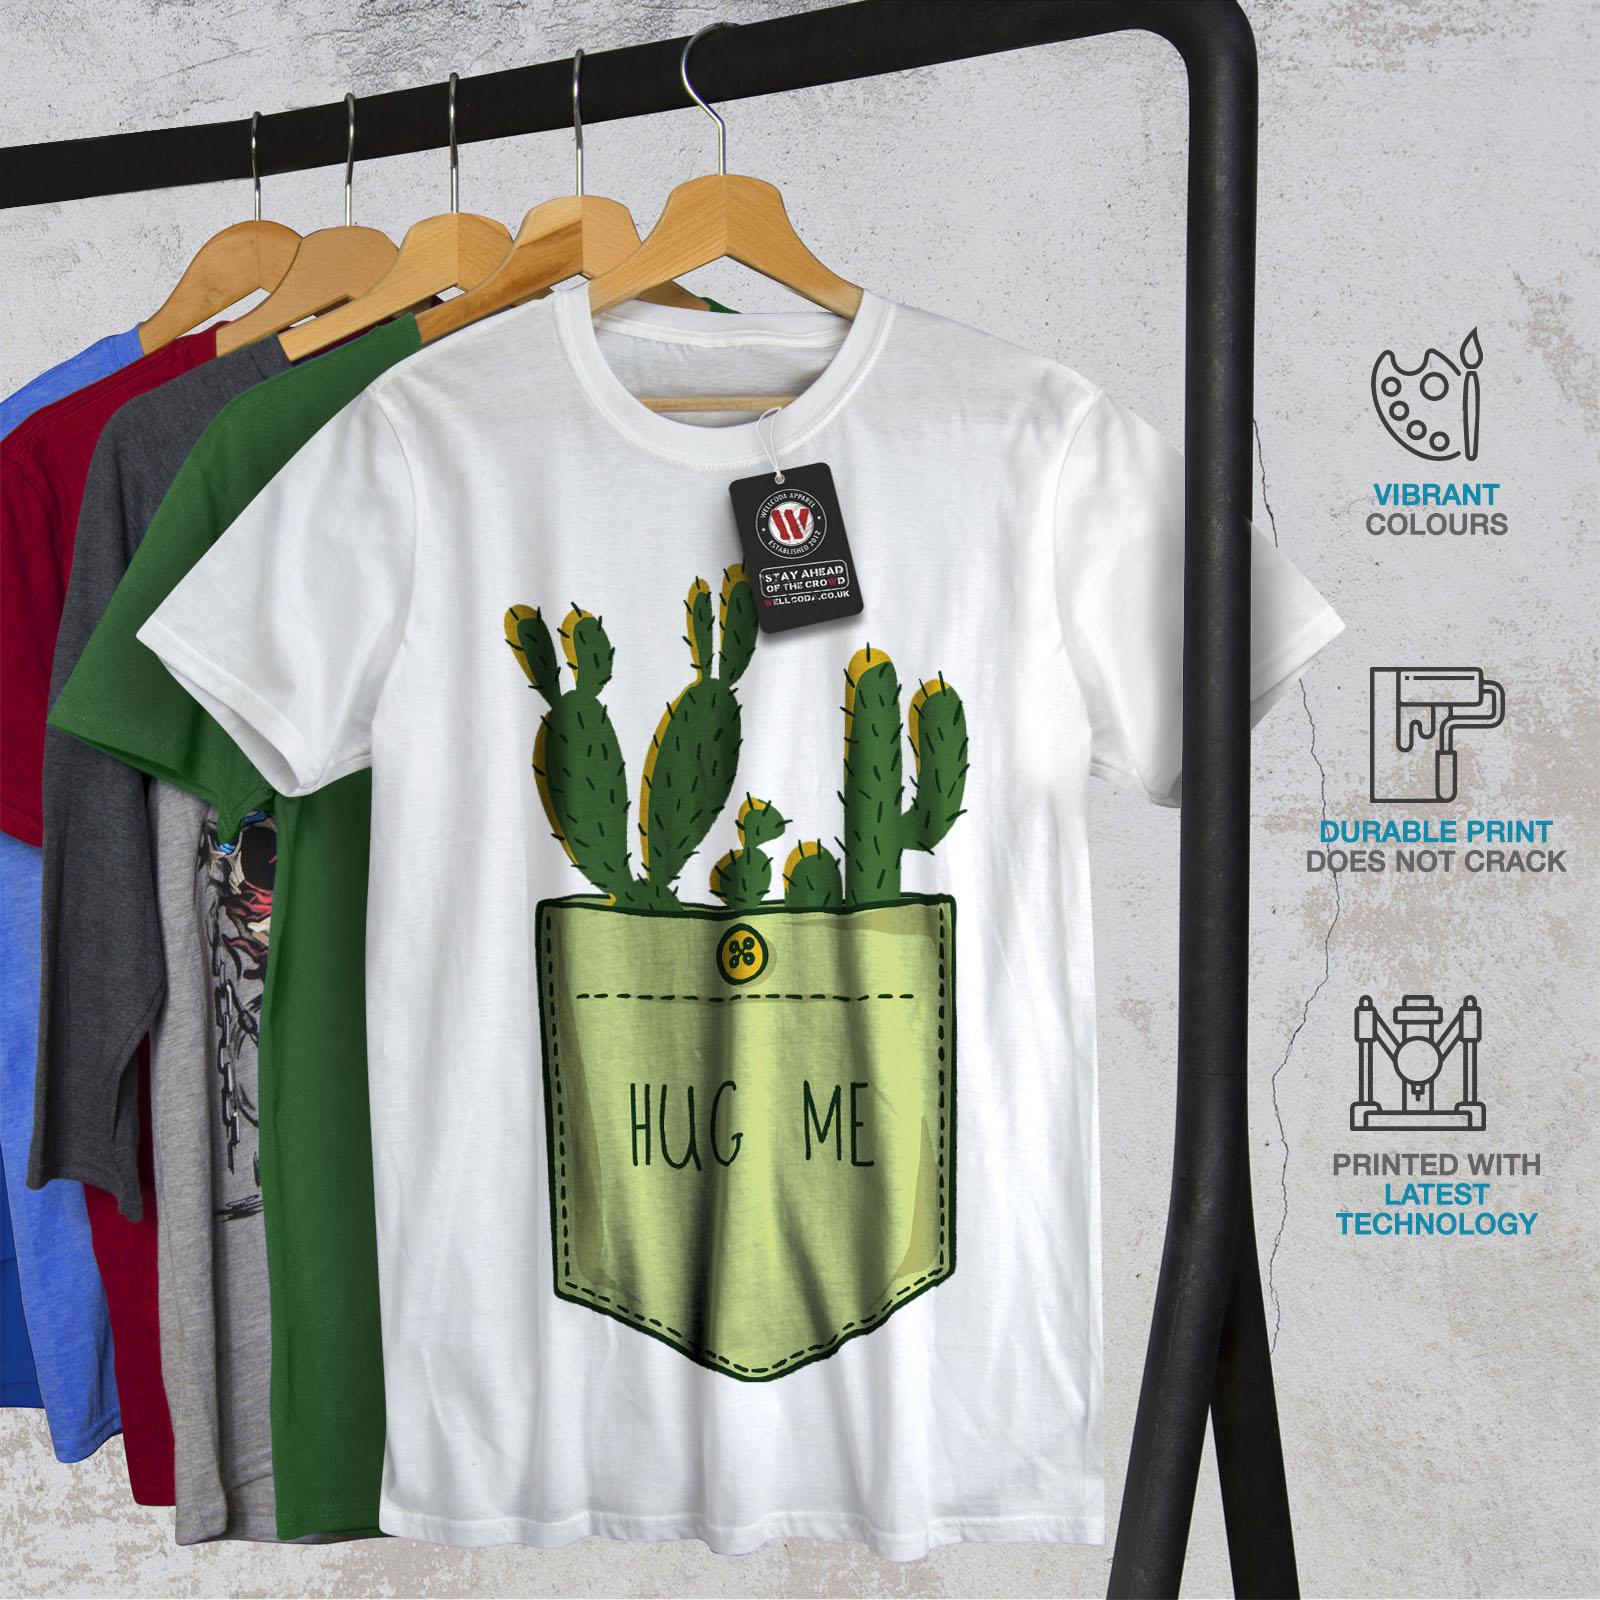 miniature 12 - Wellcoda Hug Me Cactus Funny Mens T-shirt,  Graphic Design Printed Tee